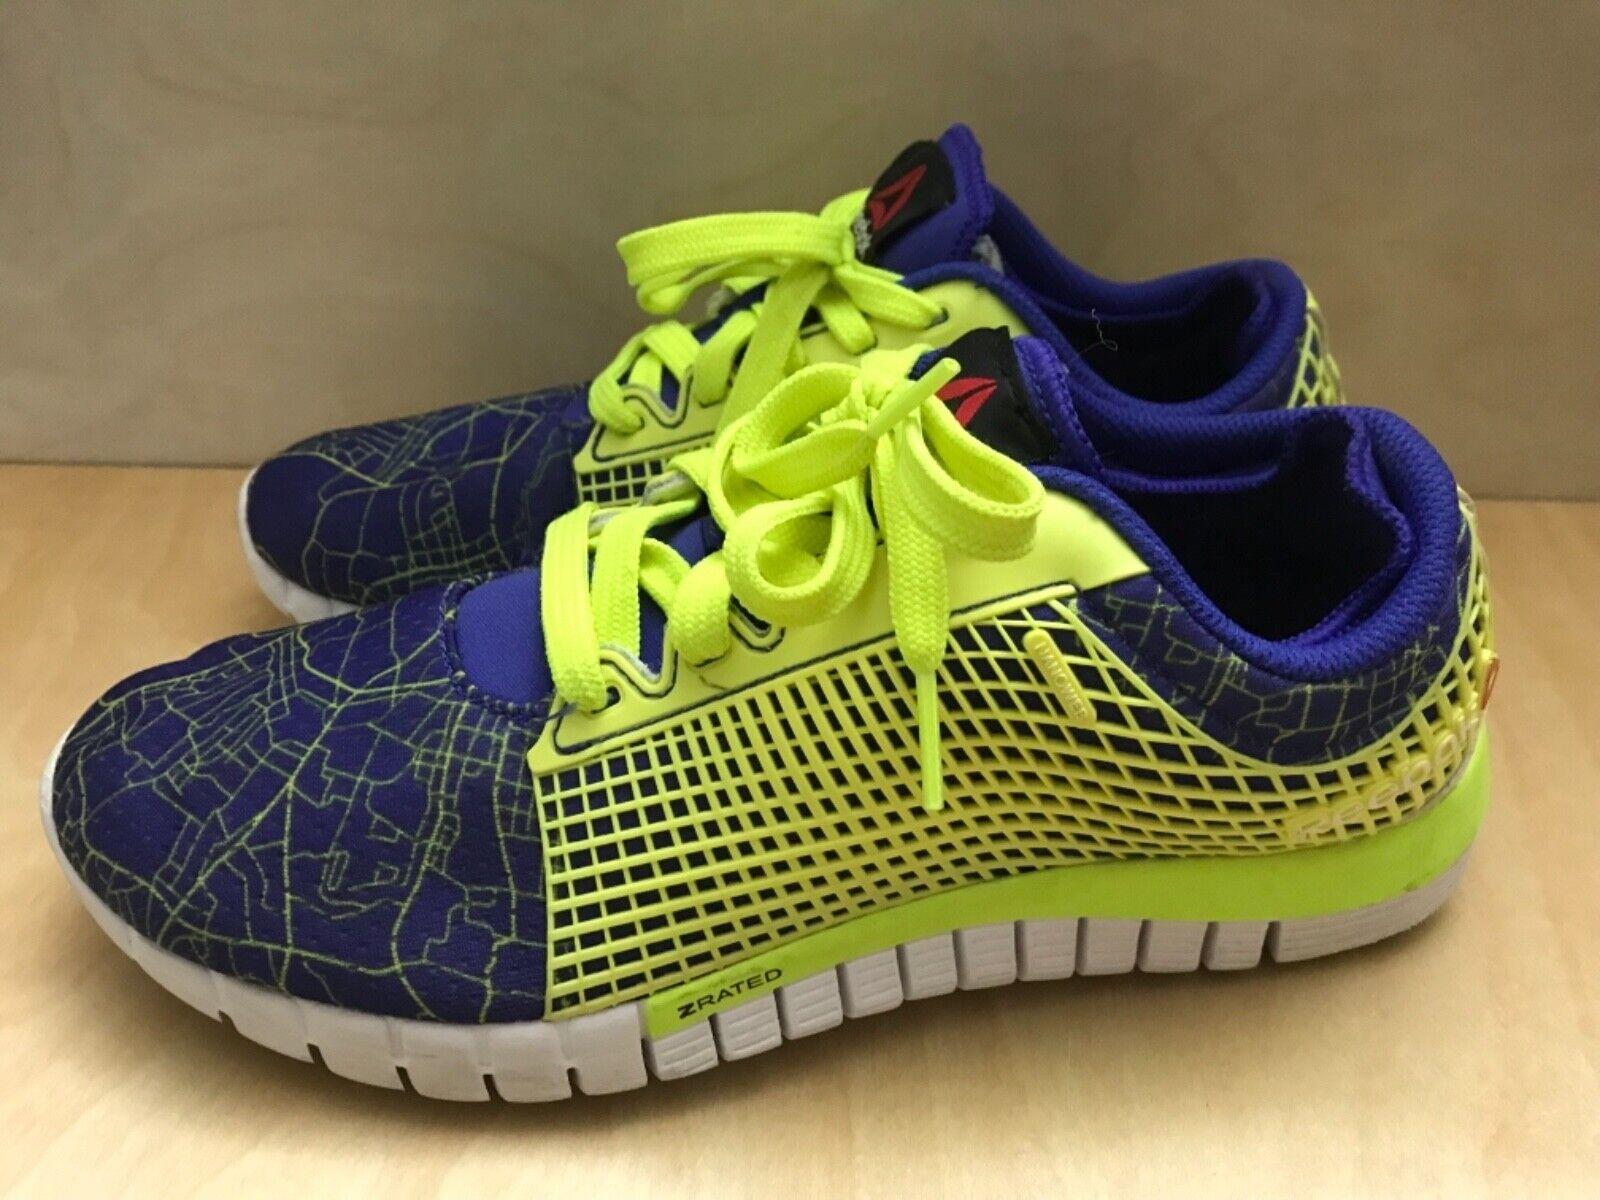 Womens ZRATED Reebok runners yellow bluee size 8